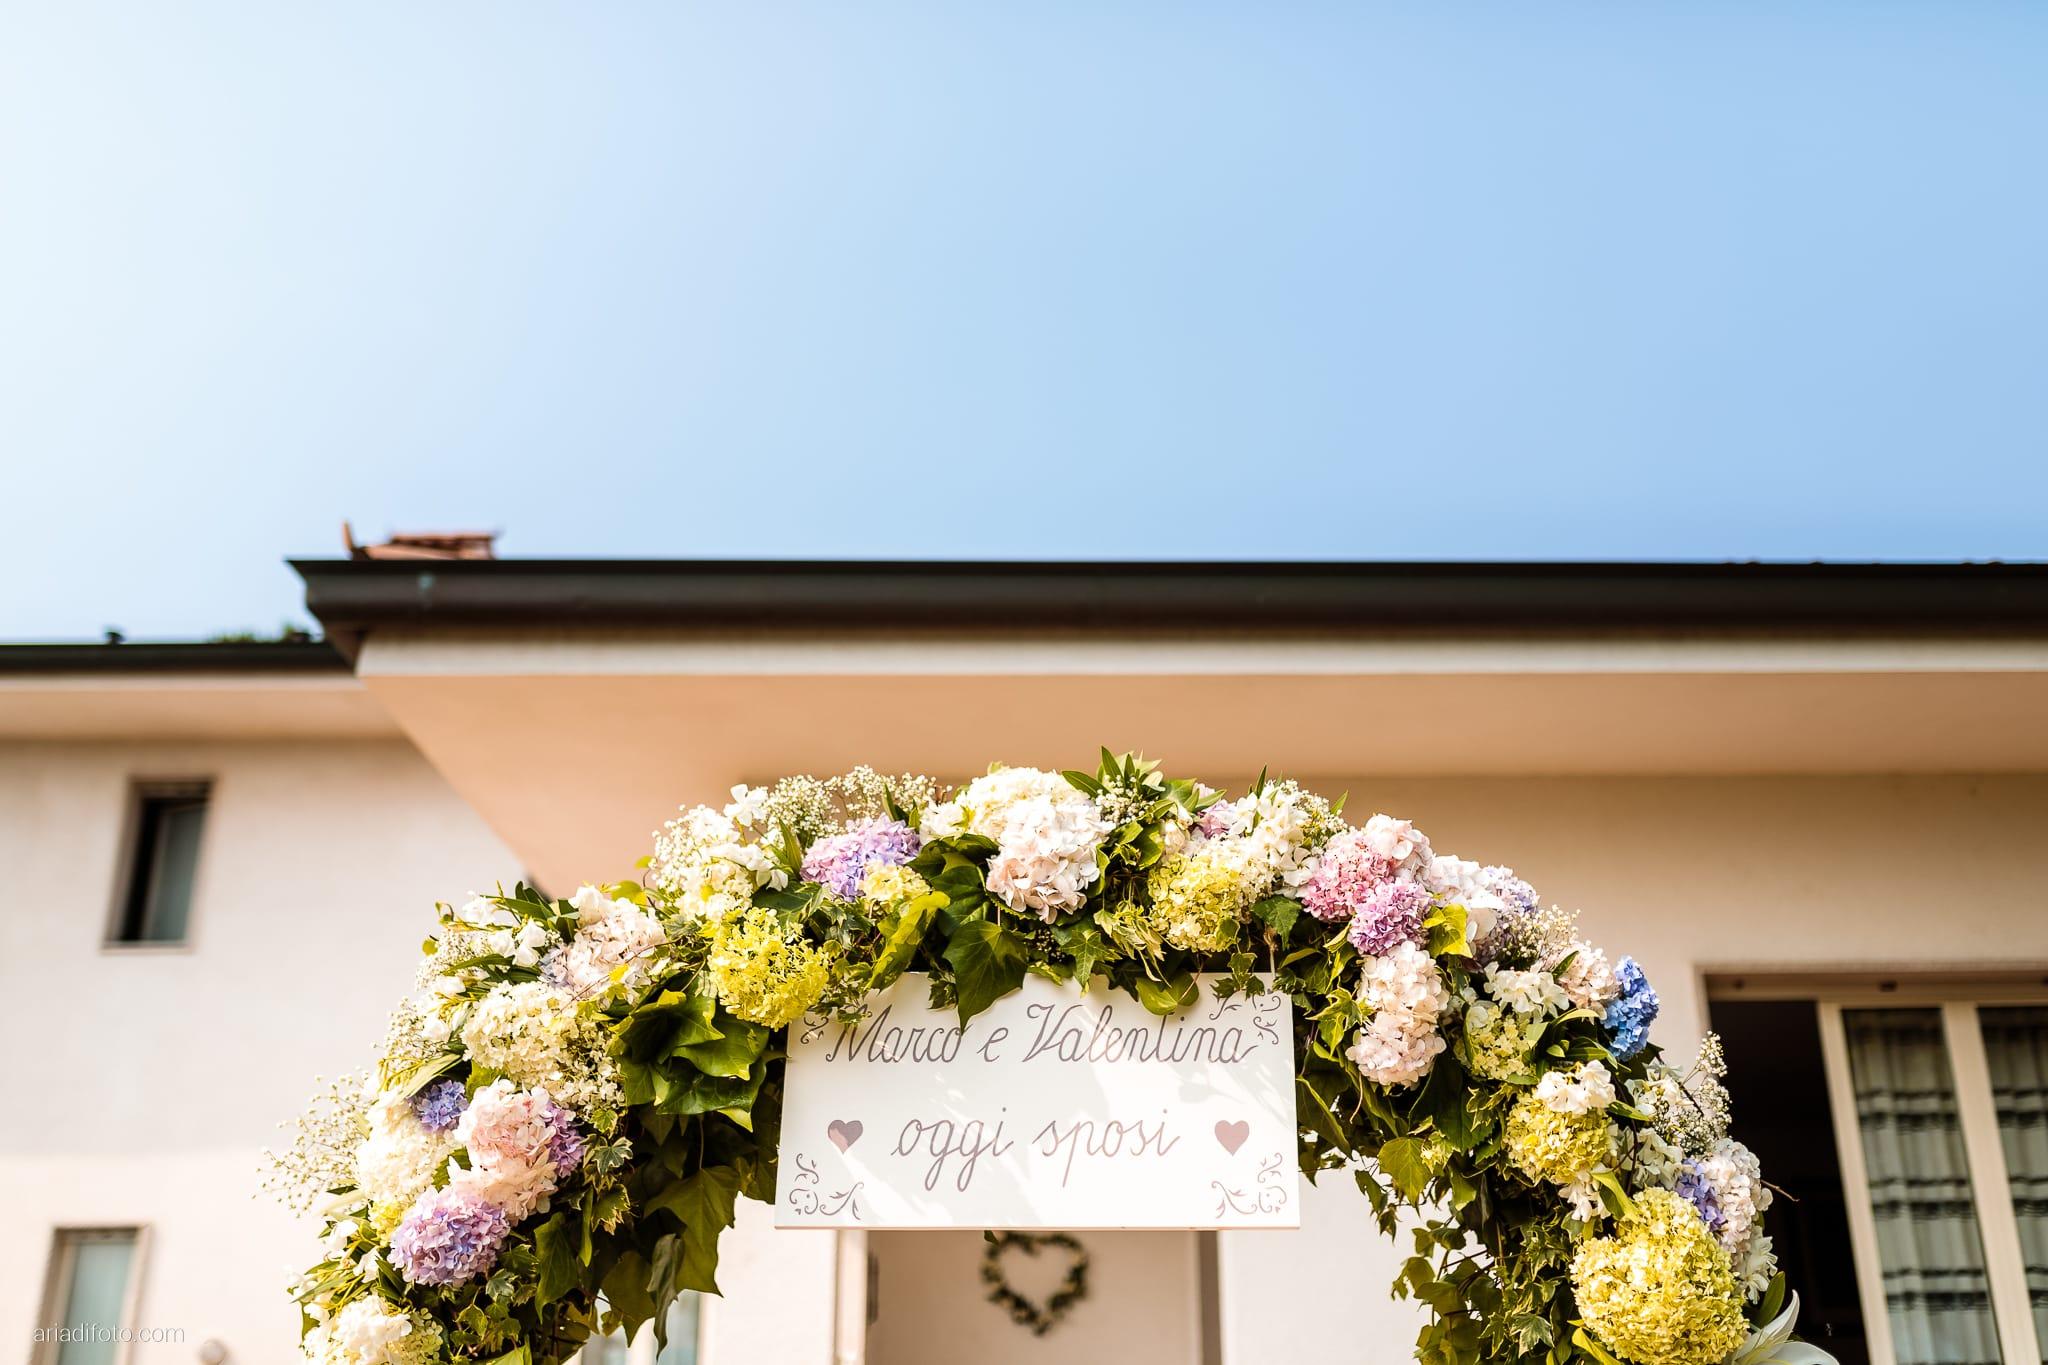 Valentina Marco Matrimonio Duomo Gorizia Castelvecchio Sagrado preparativi sposa dettagli arco fiori